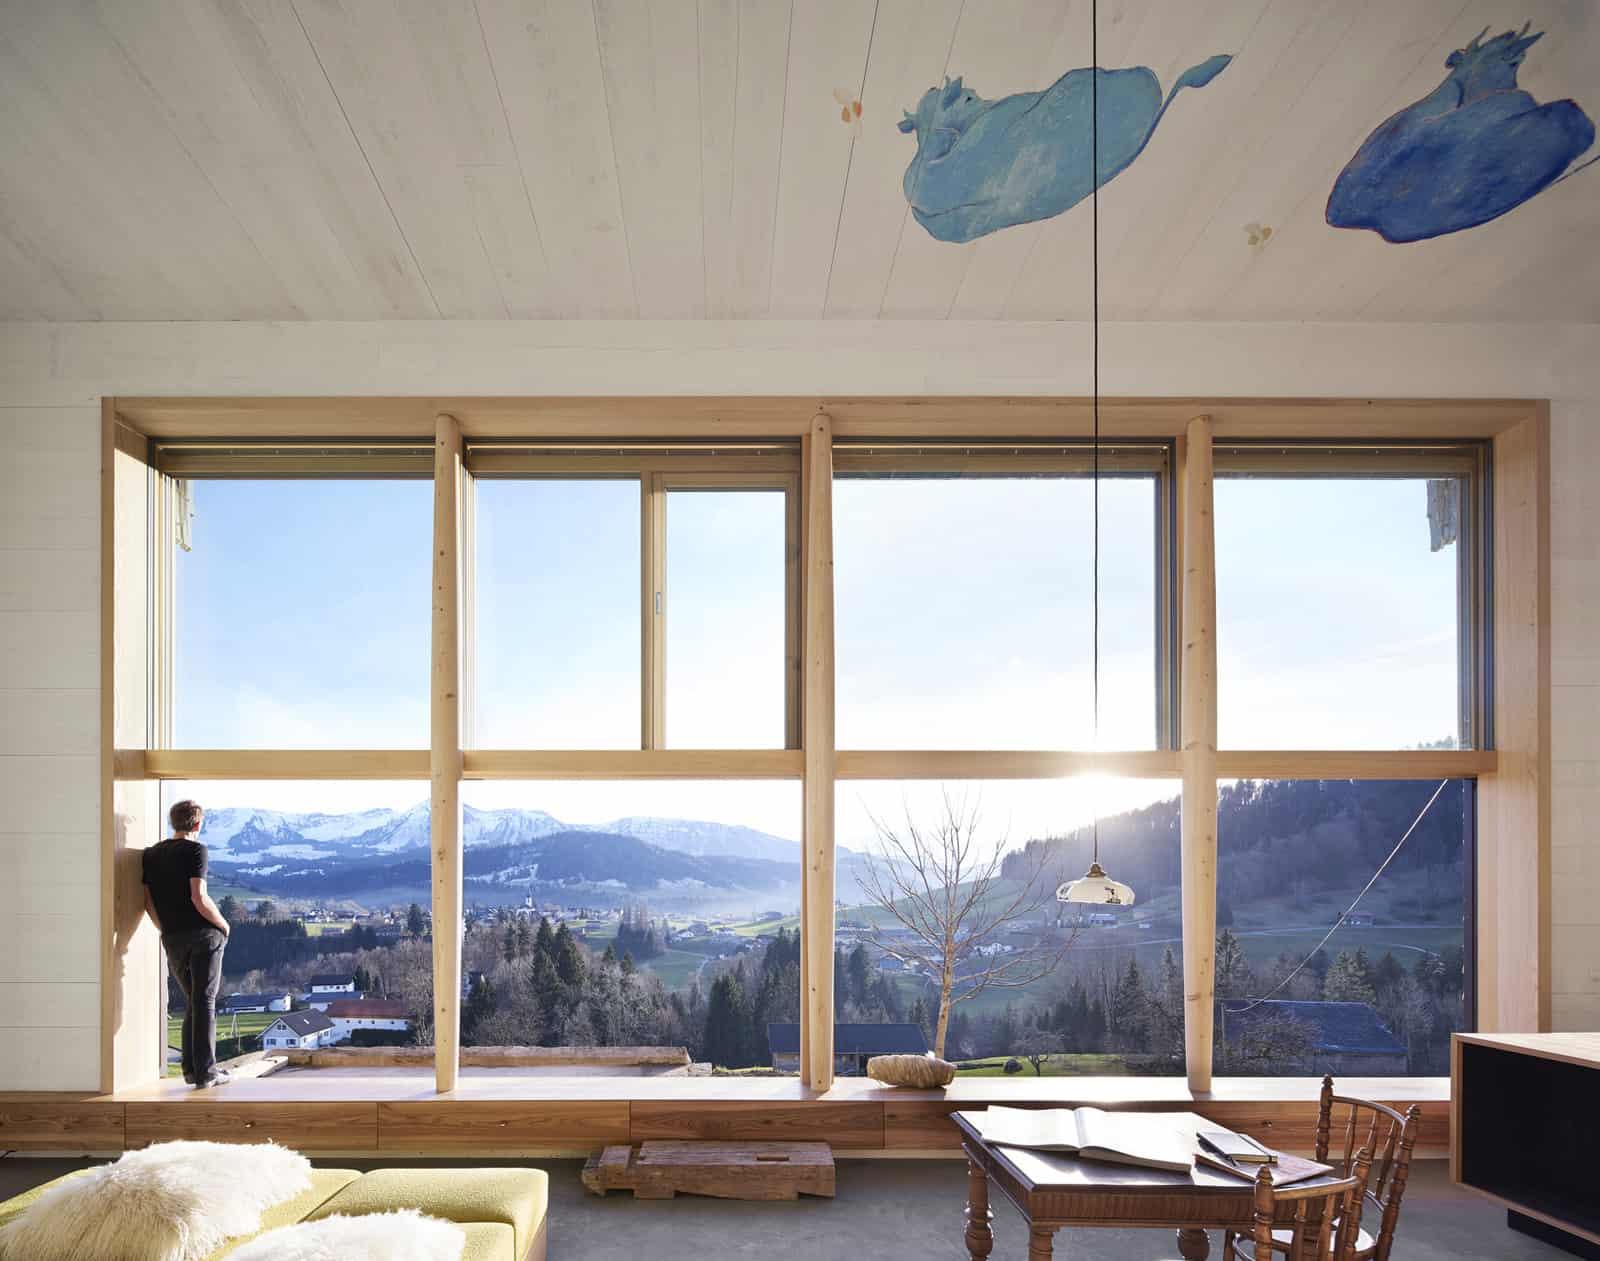 Loft with Wonderful Views of the Mountains in Hittisau, Austria